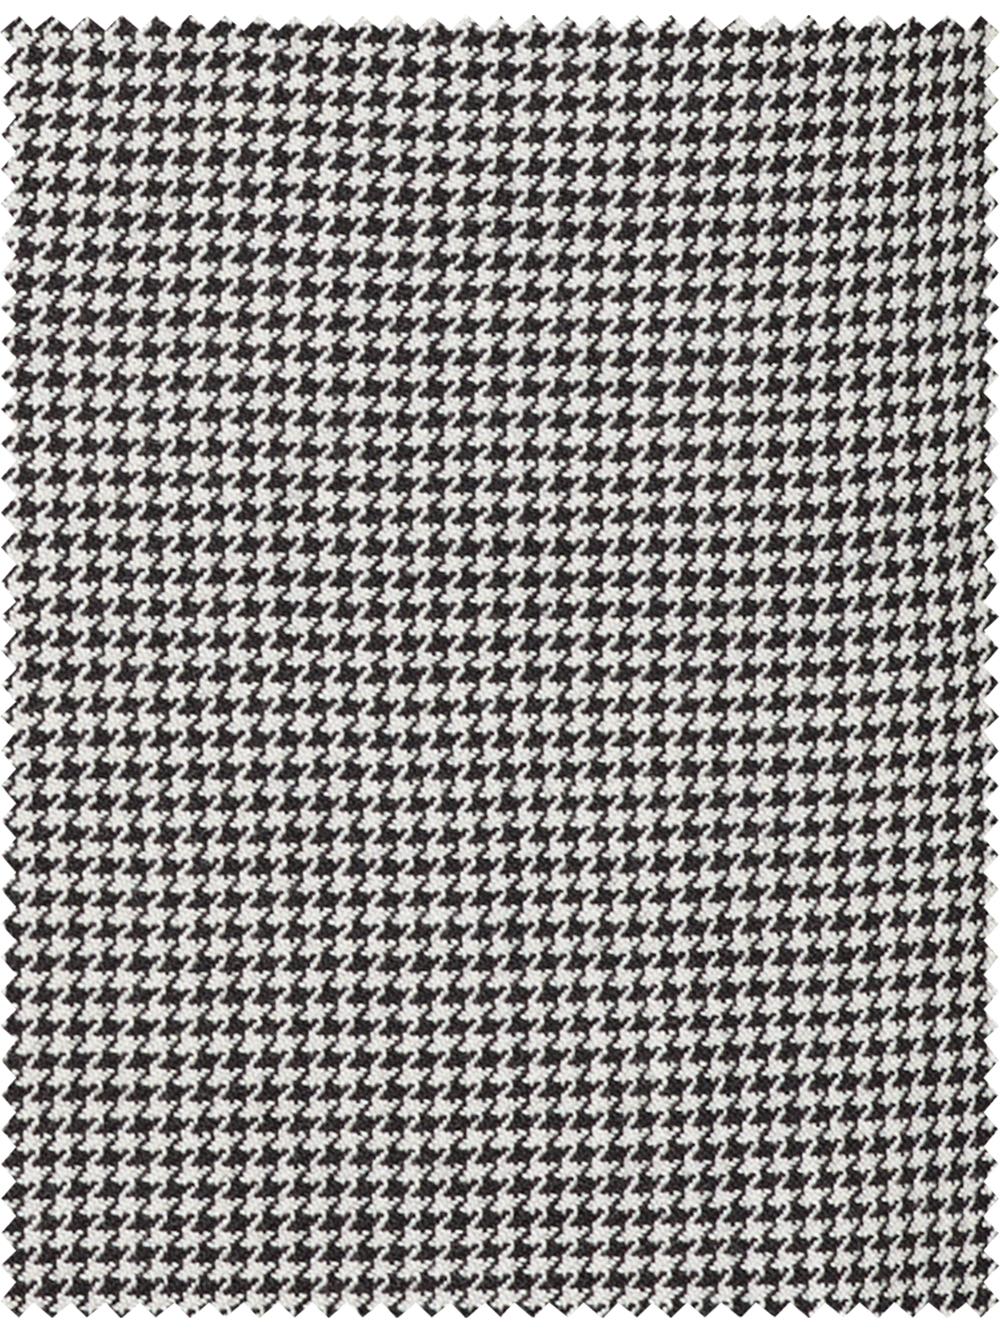 8f99980ff9c70 Wool Houndstooth Peak Lapel Suit Jacket | Paul Fredrick